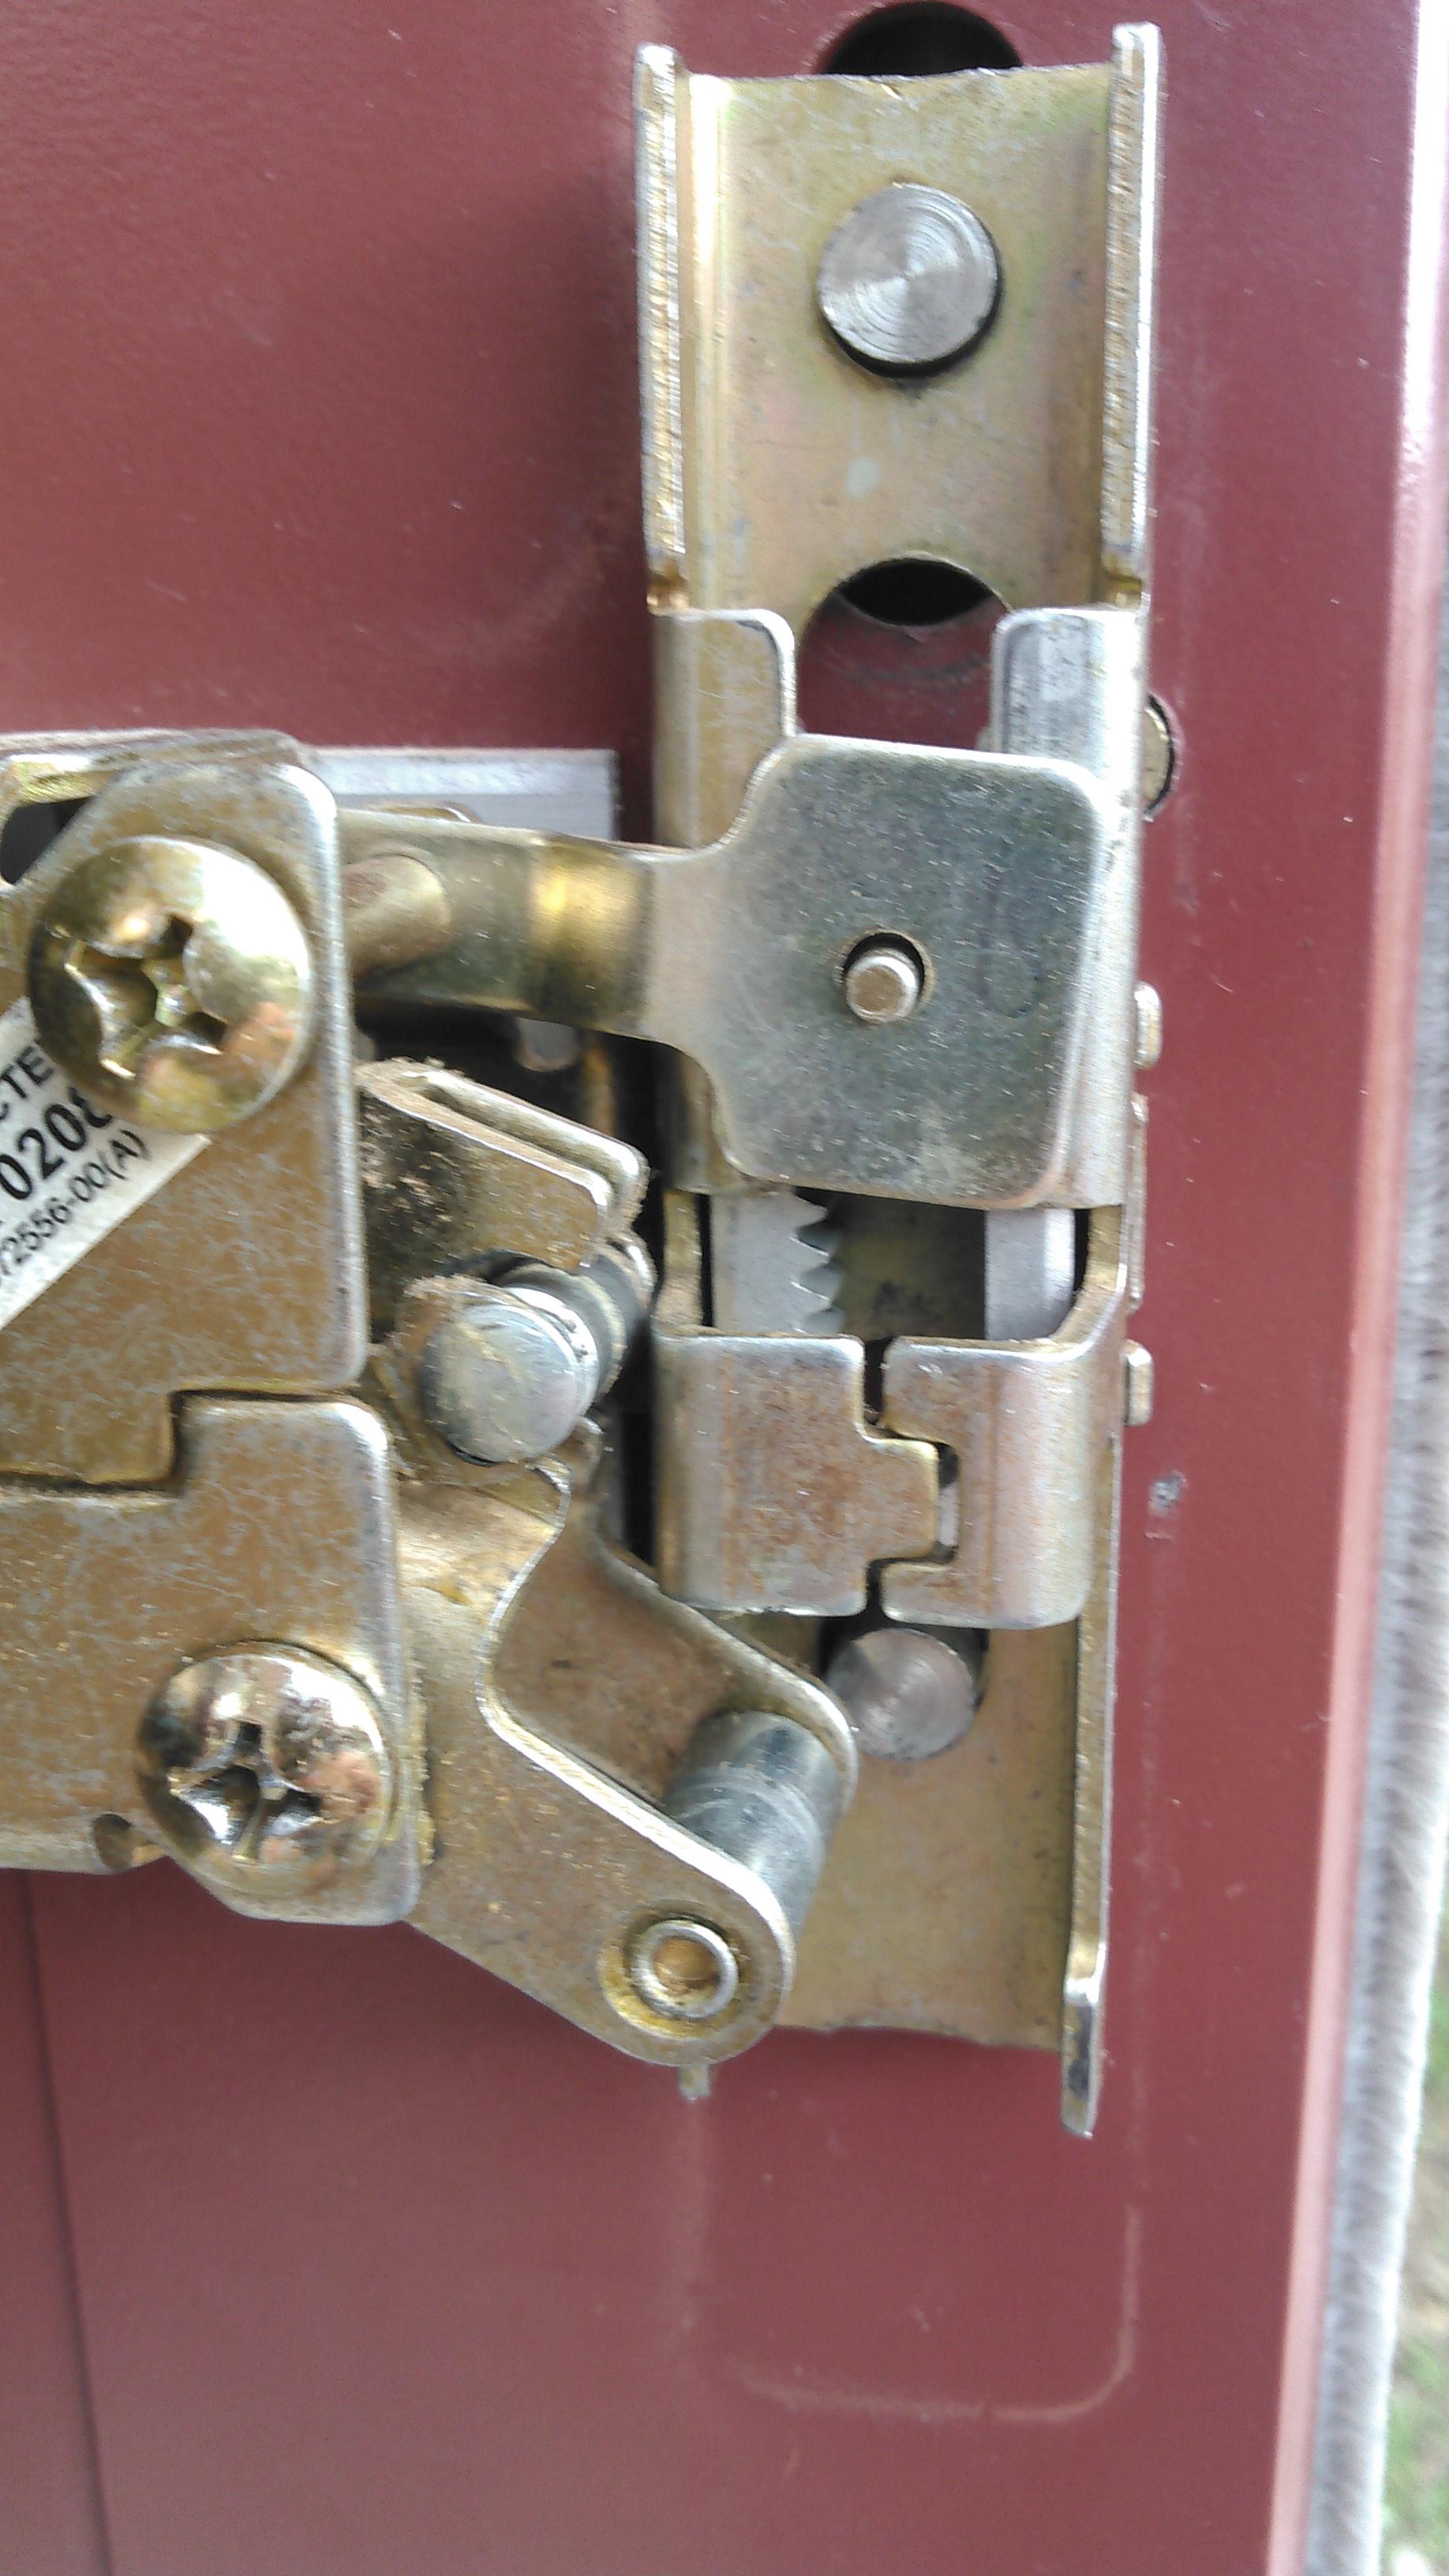 Dor O Matic Concealed Vertical Rod 1690 Eo